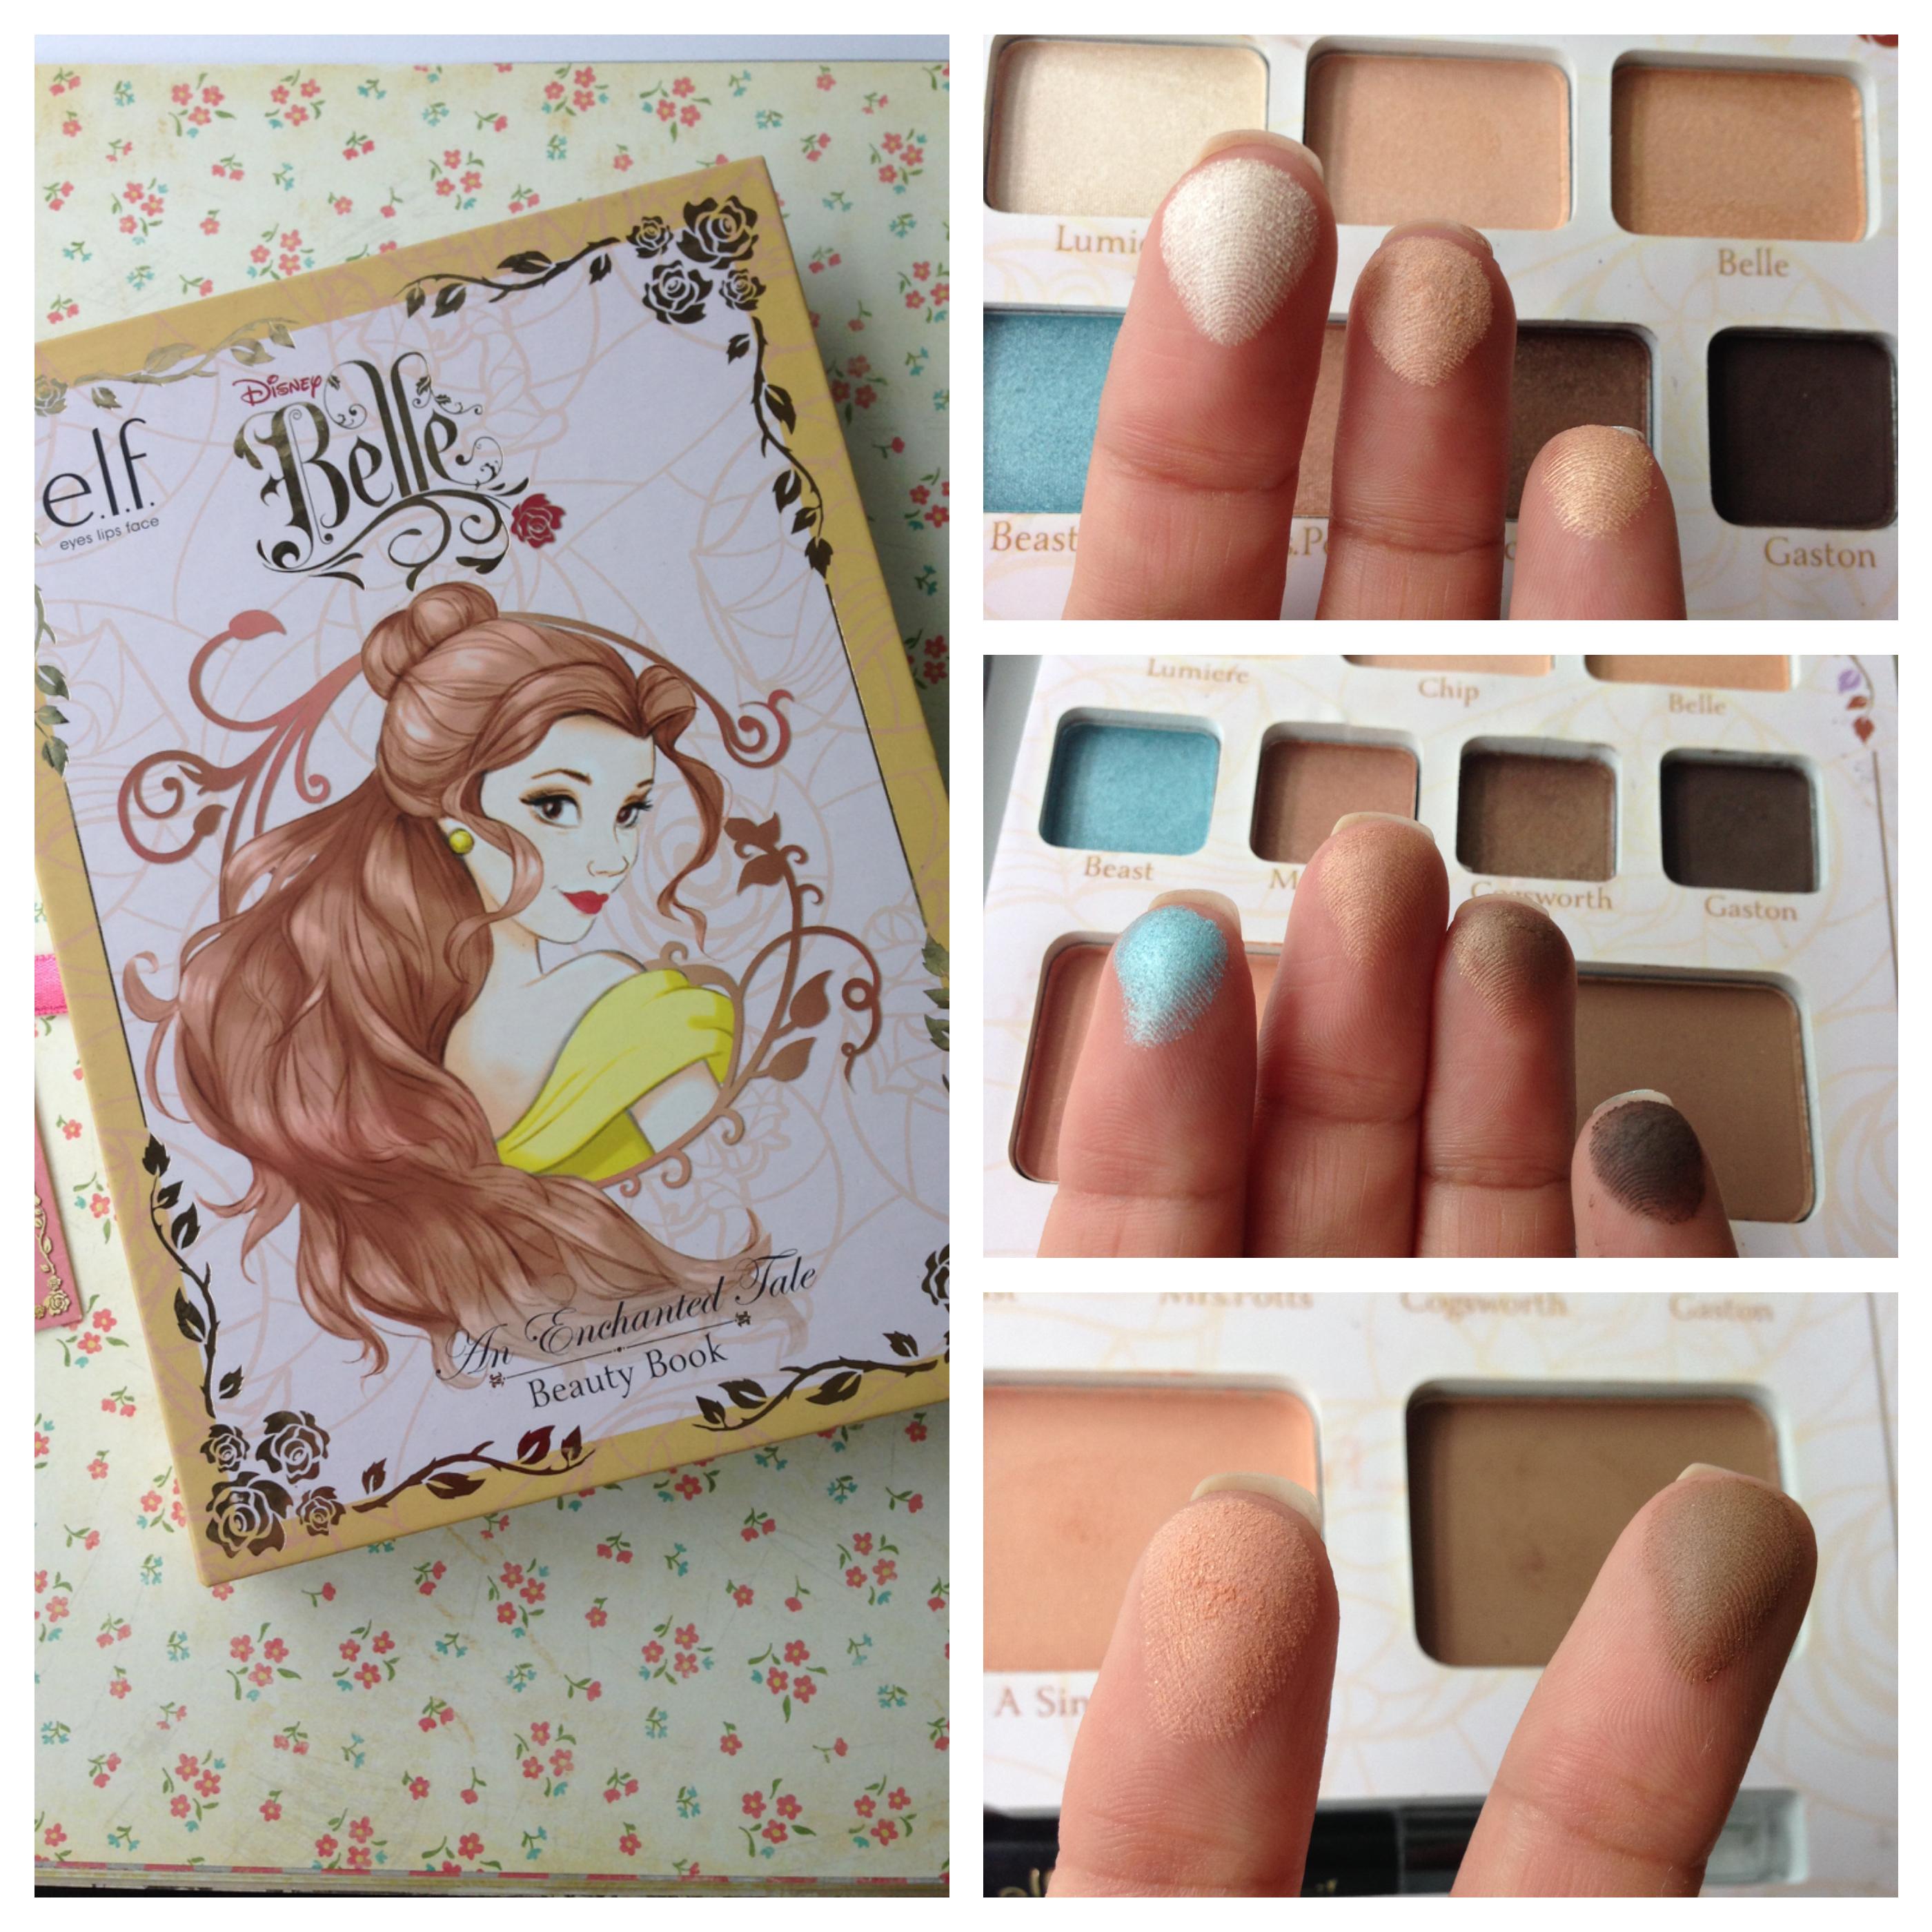 Belle book 2